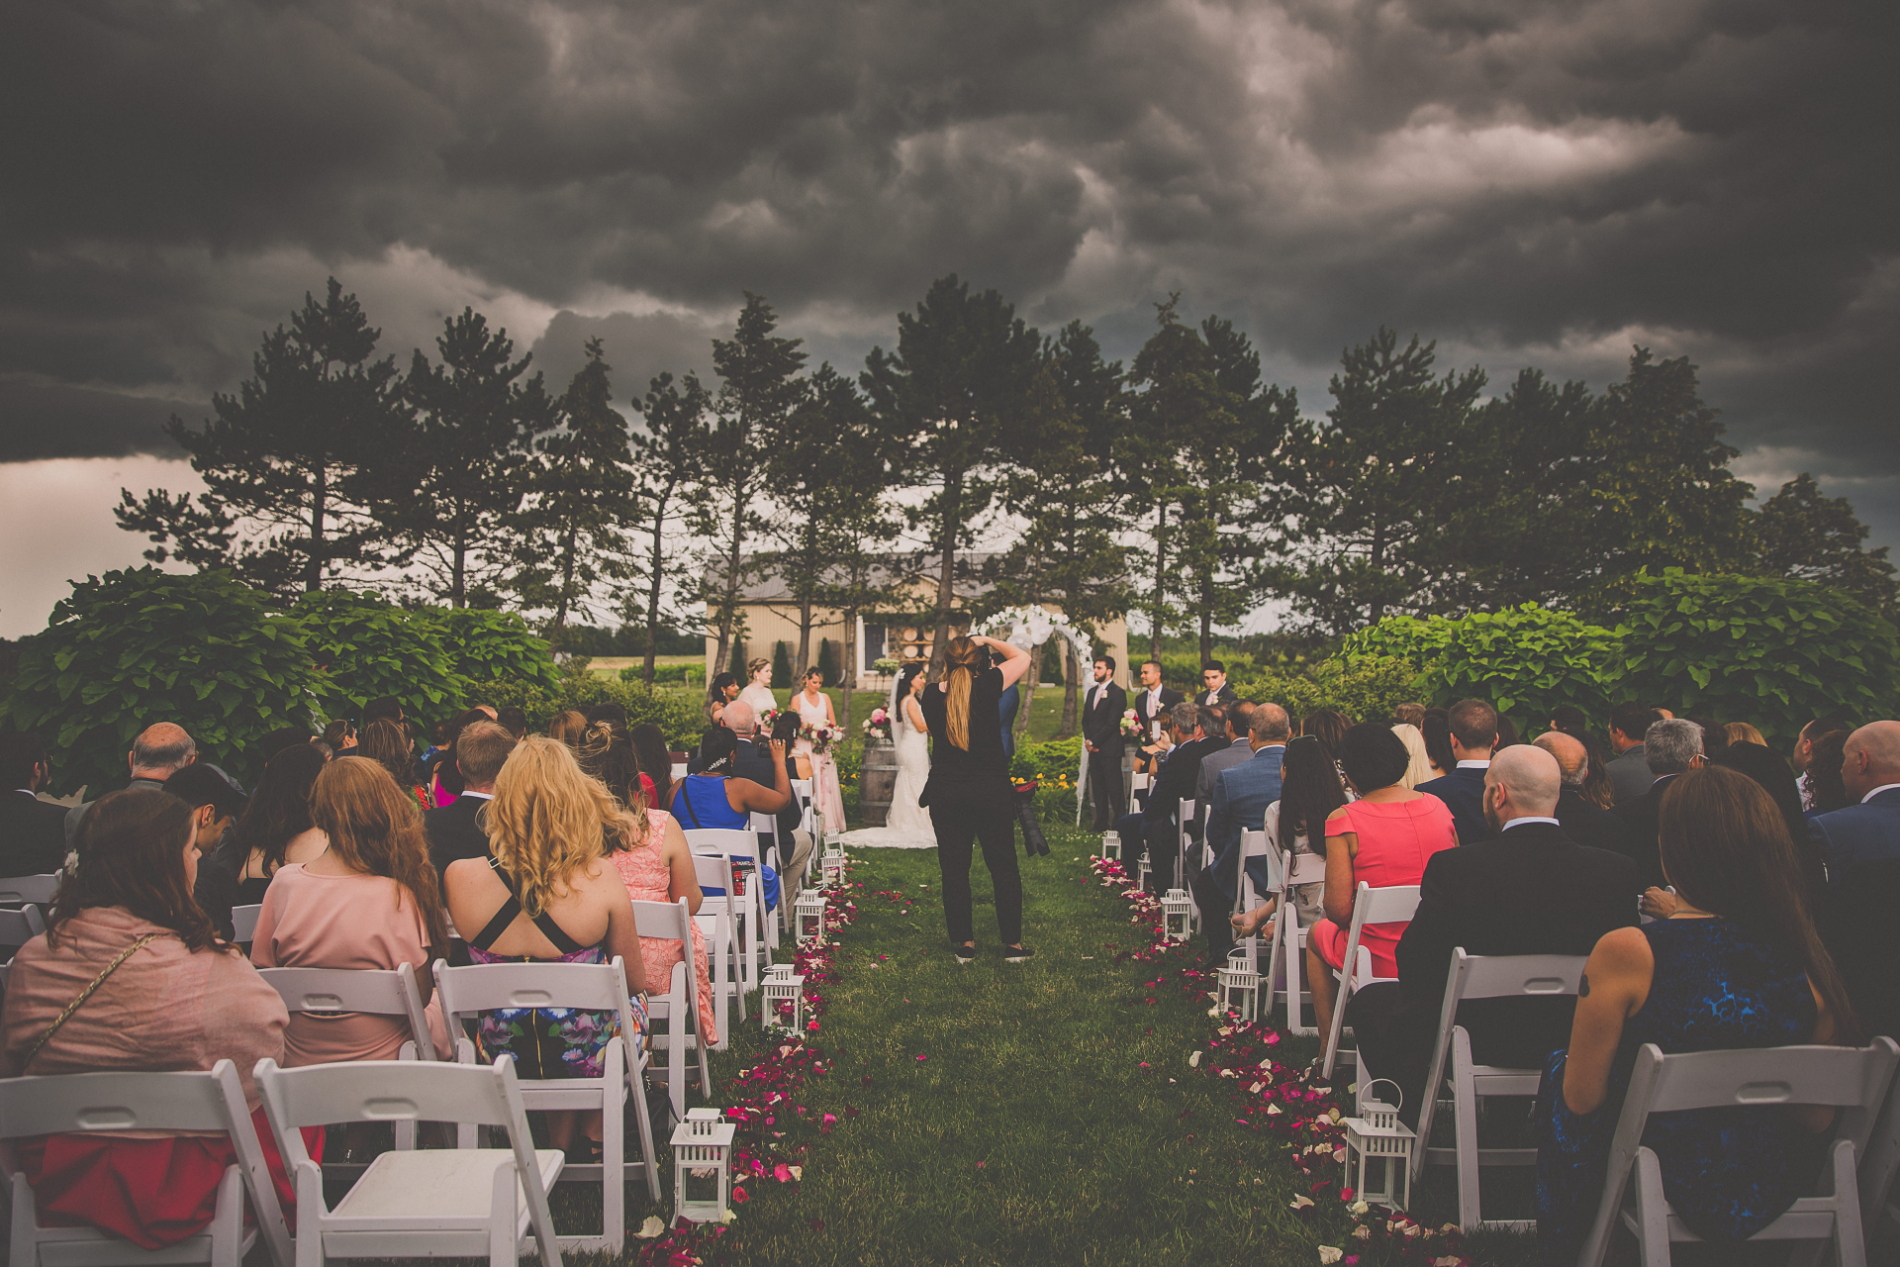 Ontario, Canada storm cloud looming over wedding ceremony photographer